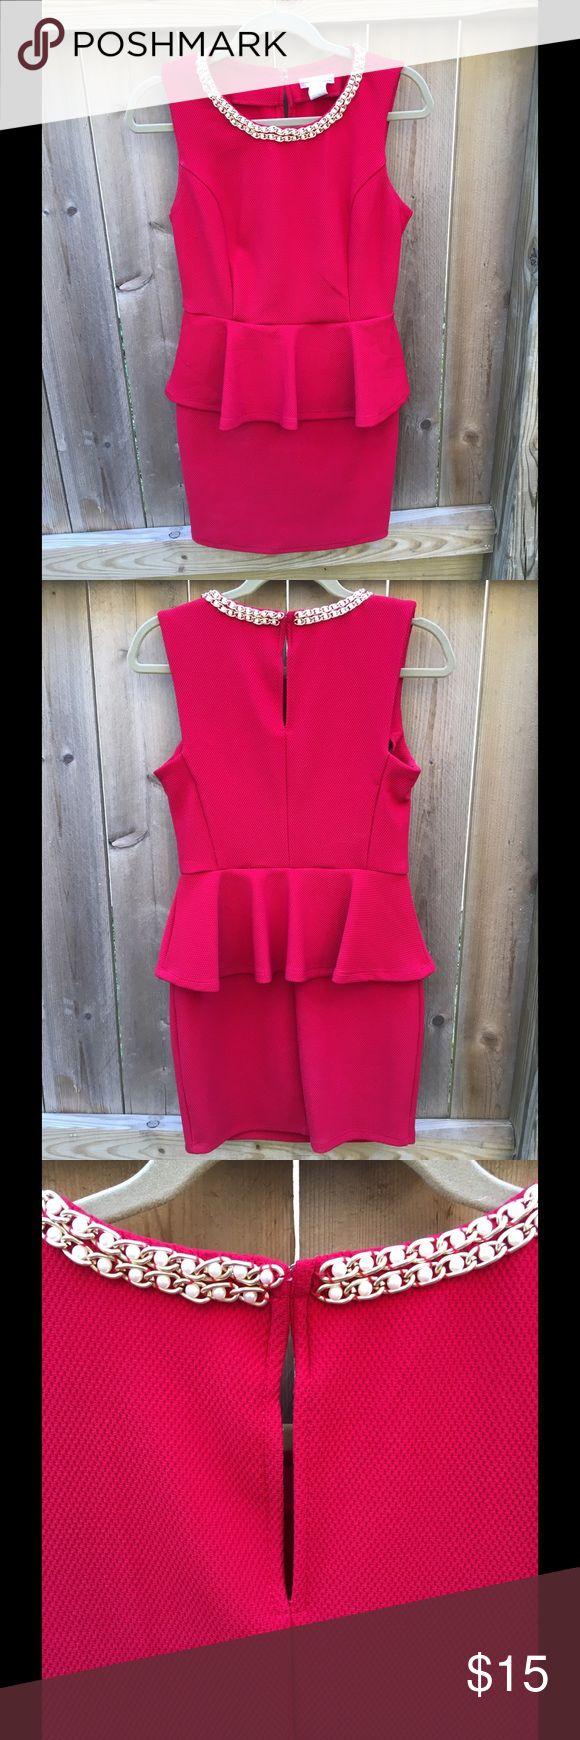 Little Red Peplum Dress w/ Pearl/Gold Neck  (M) Little Red Peplum Dress w/ Pearl/Gold Neck  (Size M) a'gaci Dresses